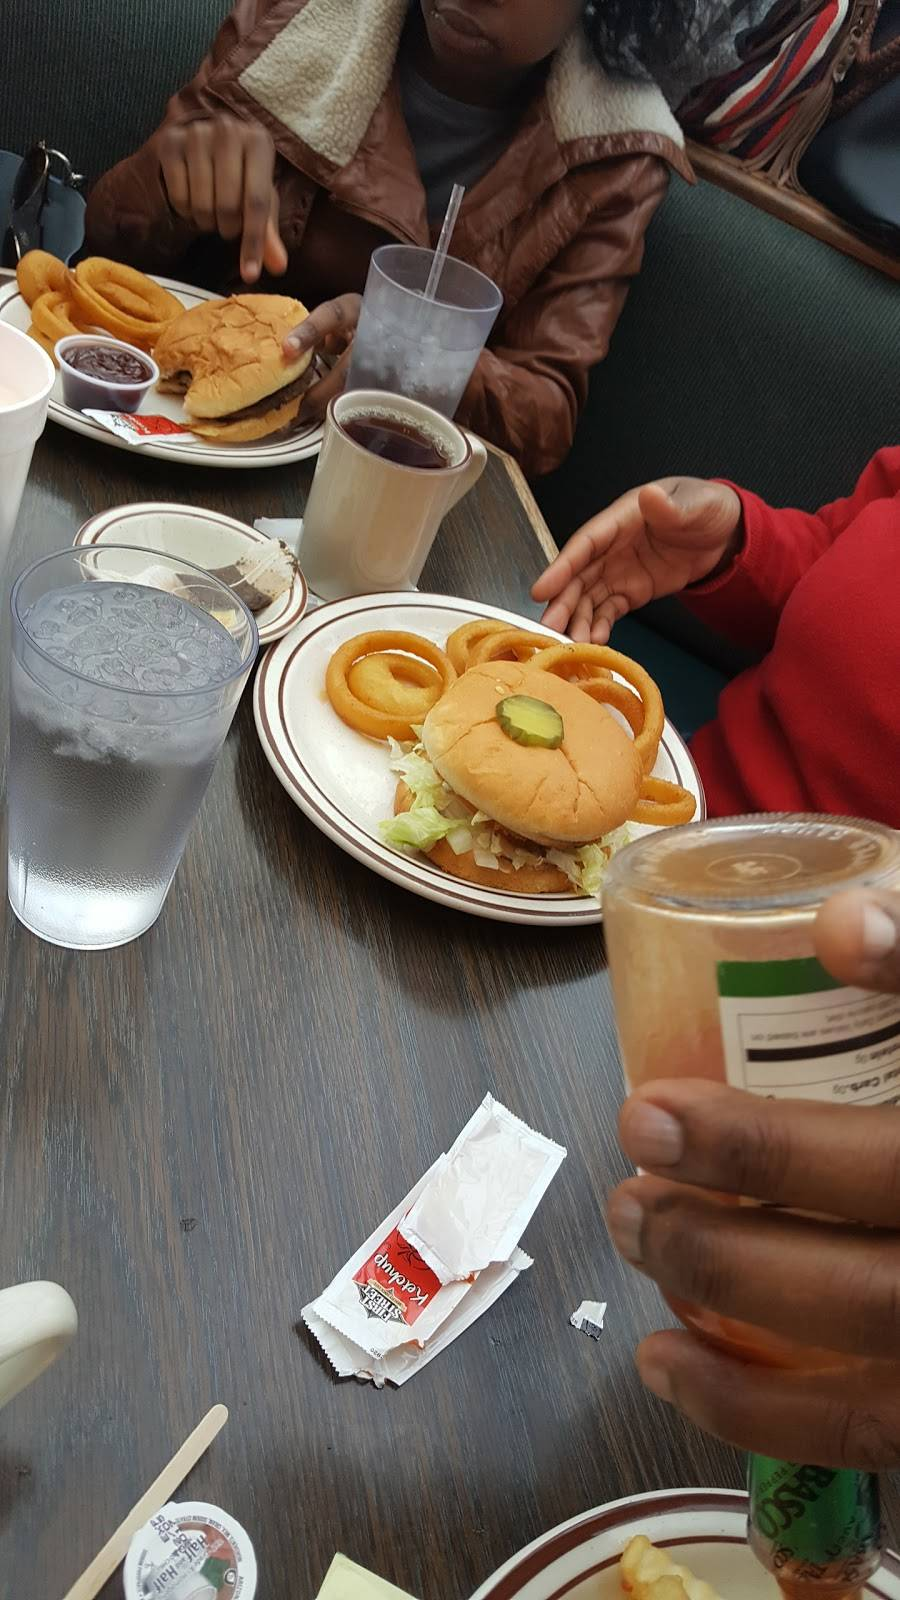 Fountain Drive-In | restaurant | 127 E Division St, Arlington, WA 98223, USA | 3604356601 OR +1 360-435-6601